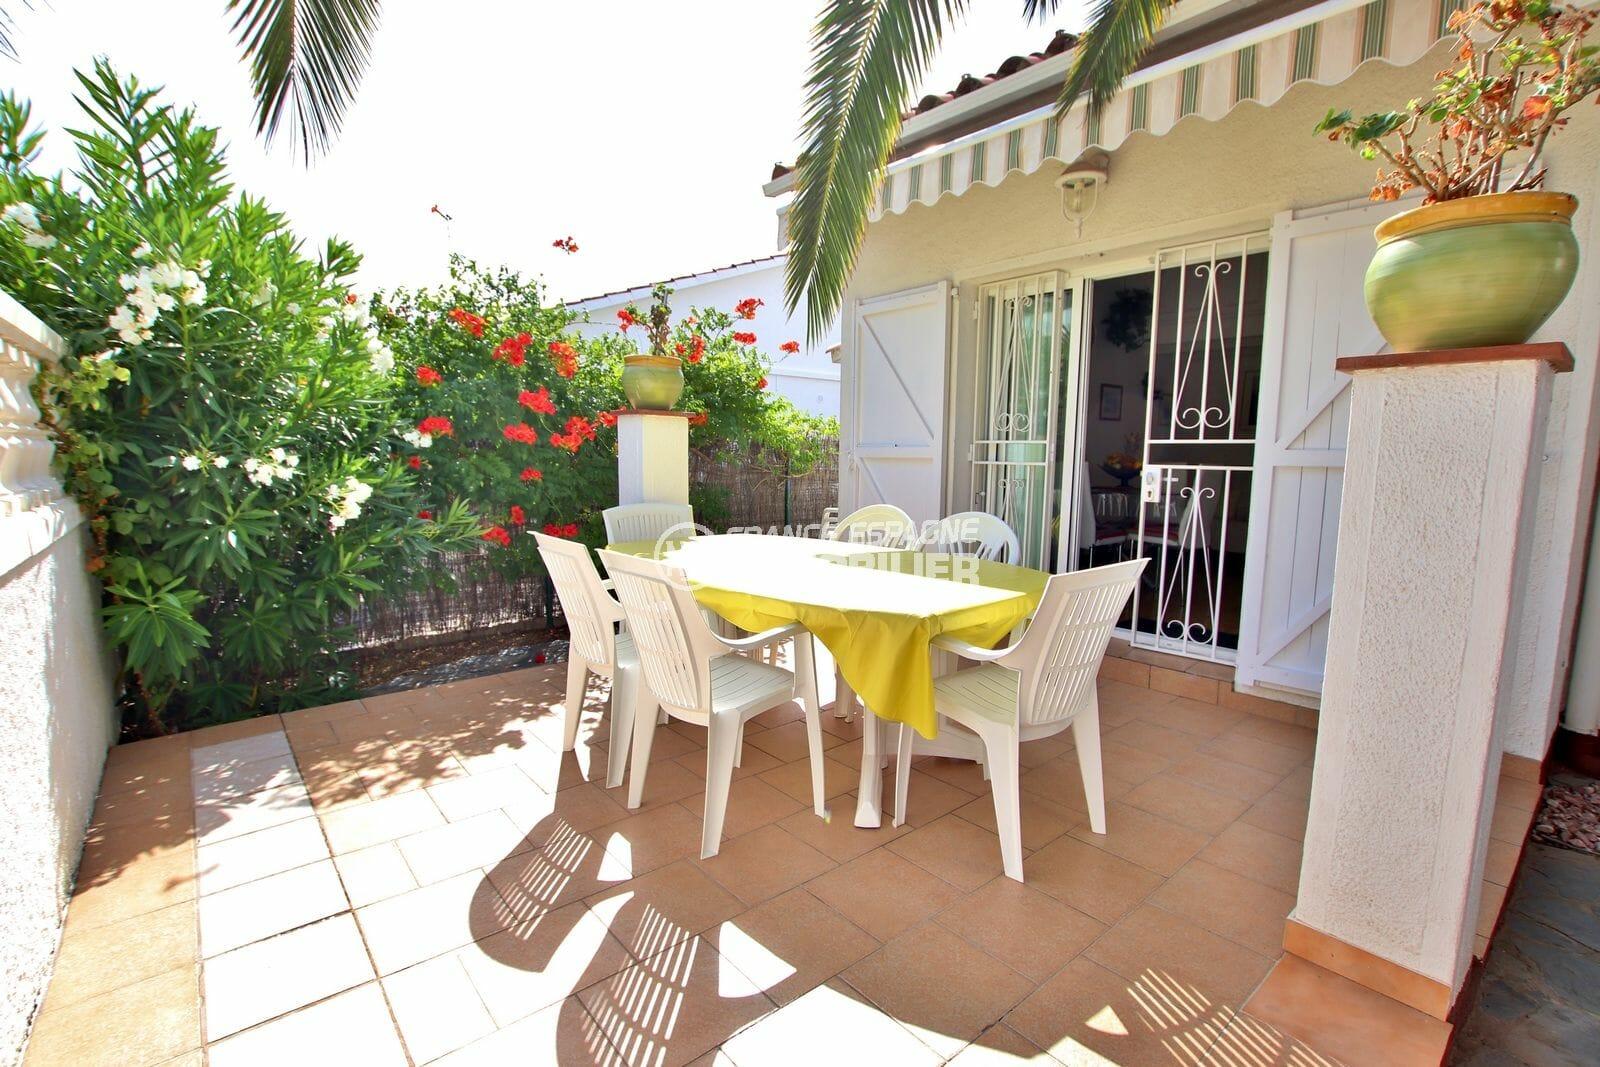 agence immobiliere santa margarita: villa 3 chambres 55 m² sur terrain de 131 m²